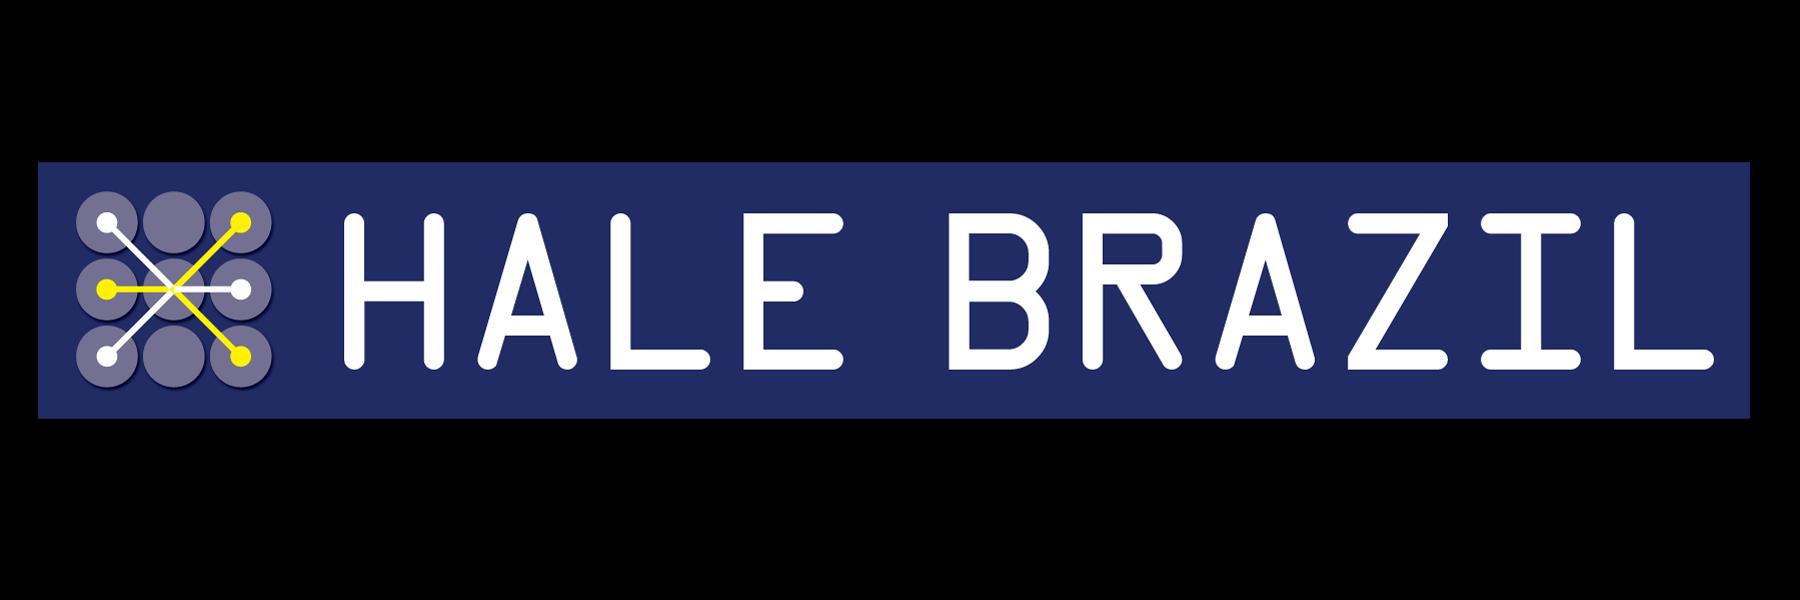 Hale Brazil